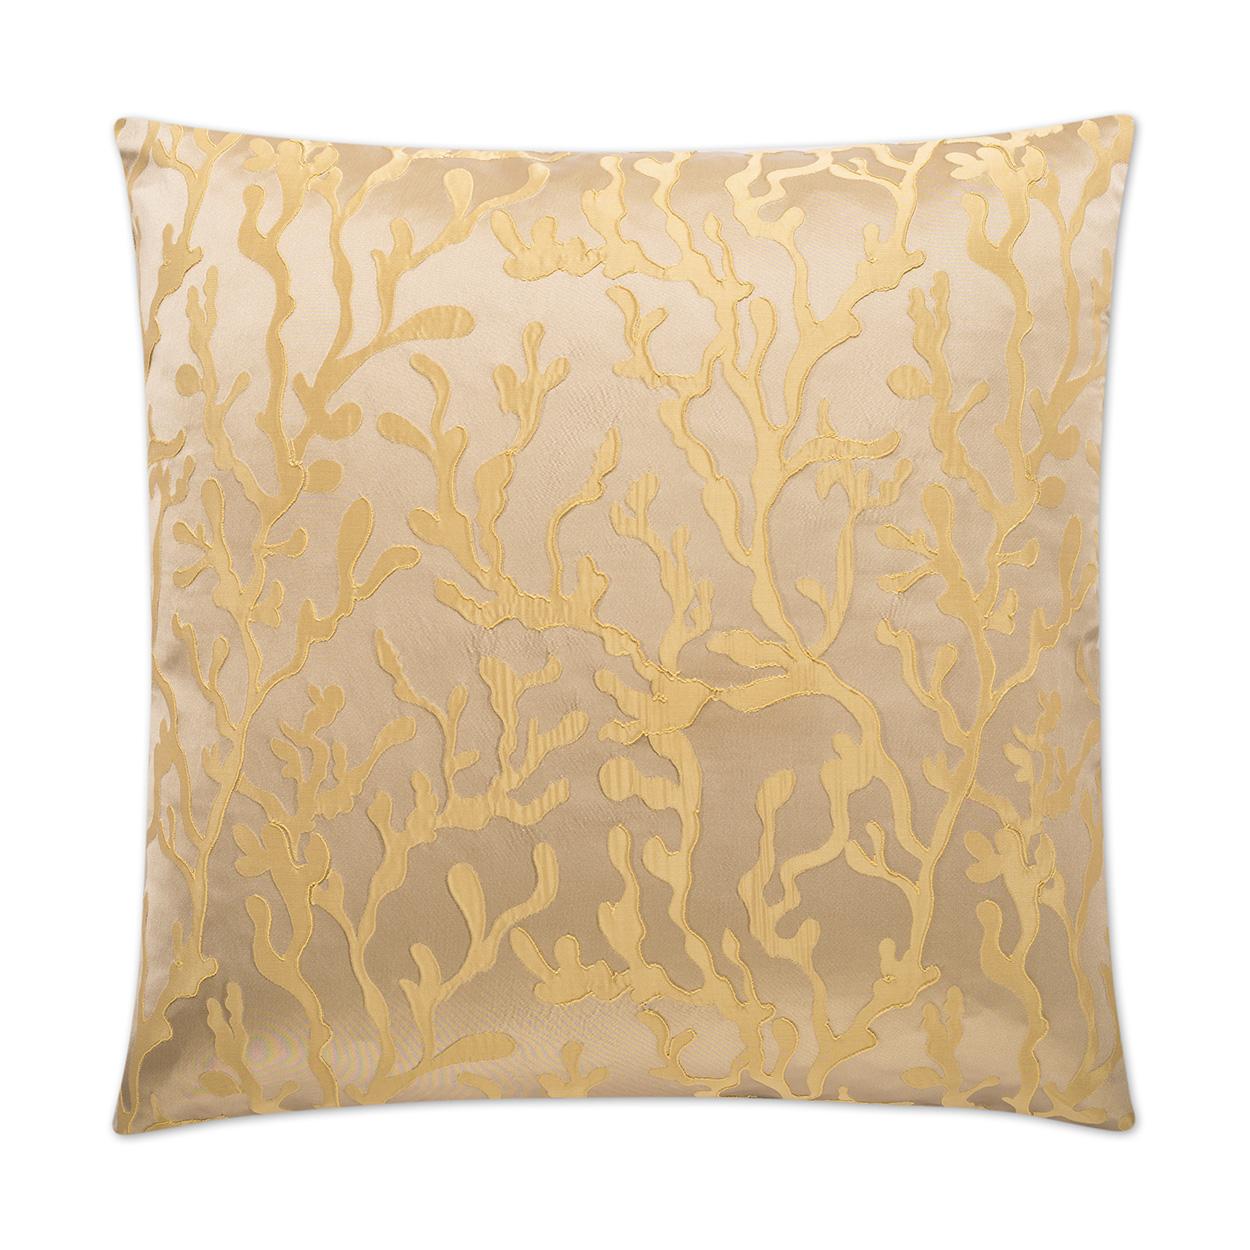 Canaan Company Barrier Gold Accent Pillow 2307G  Walmartcom